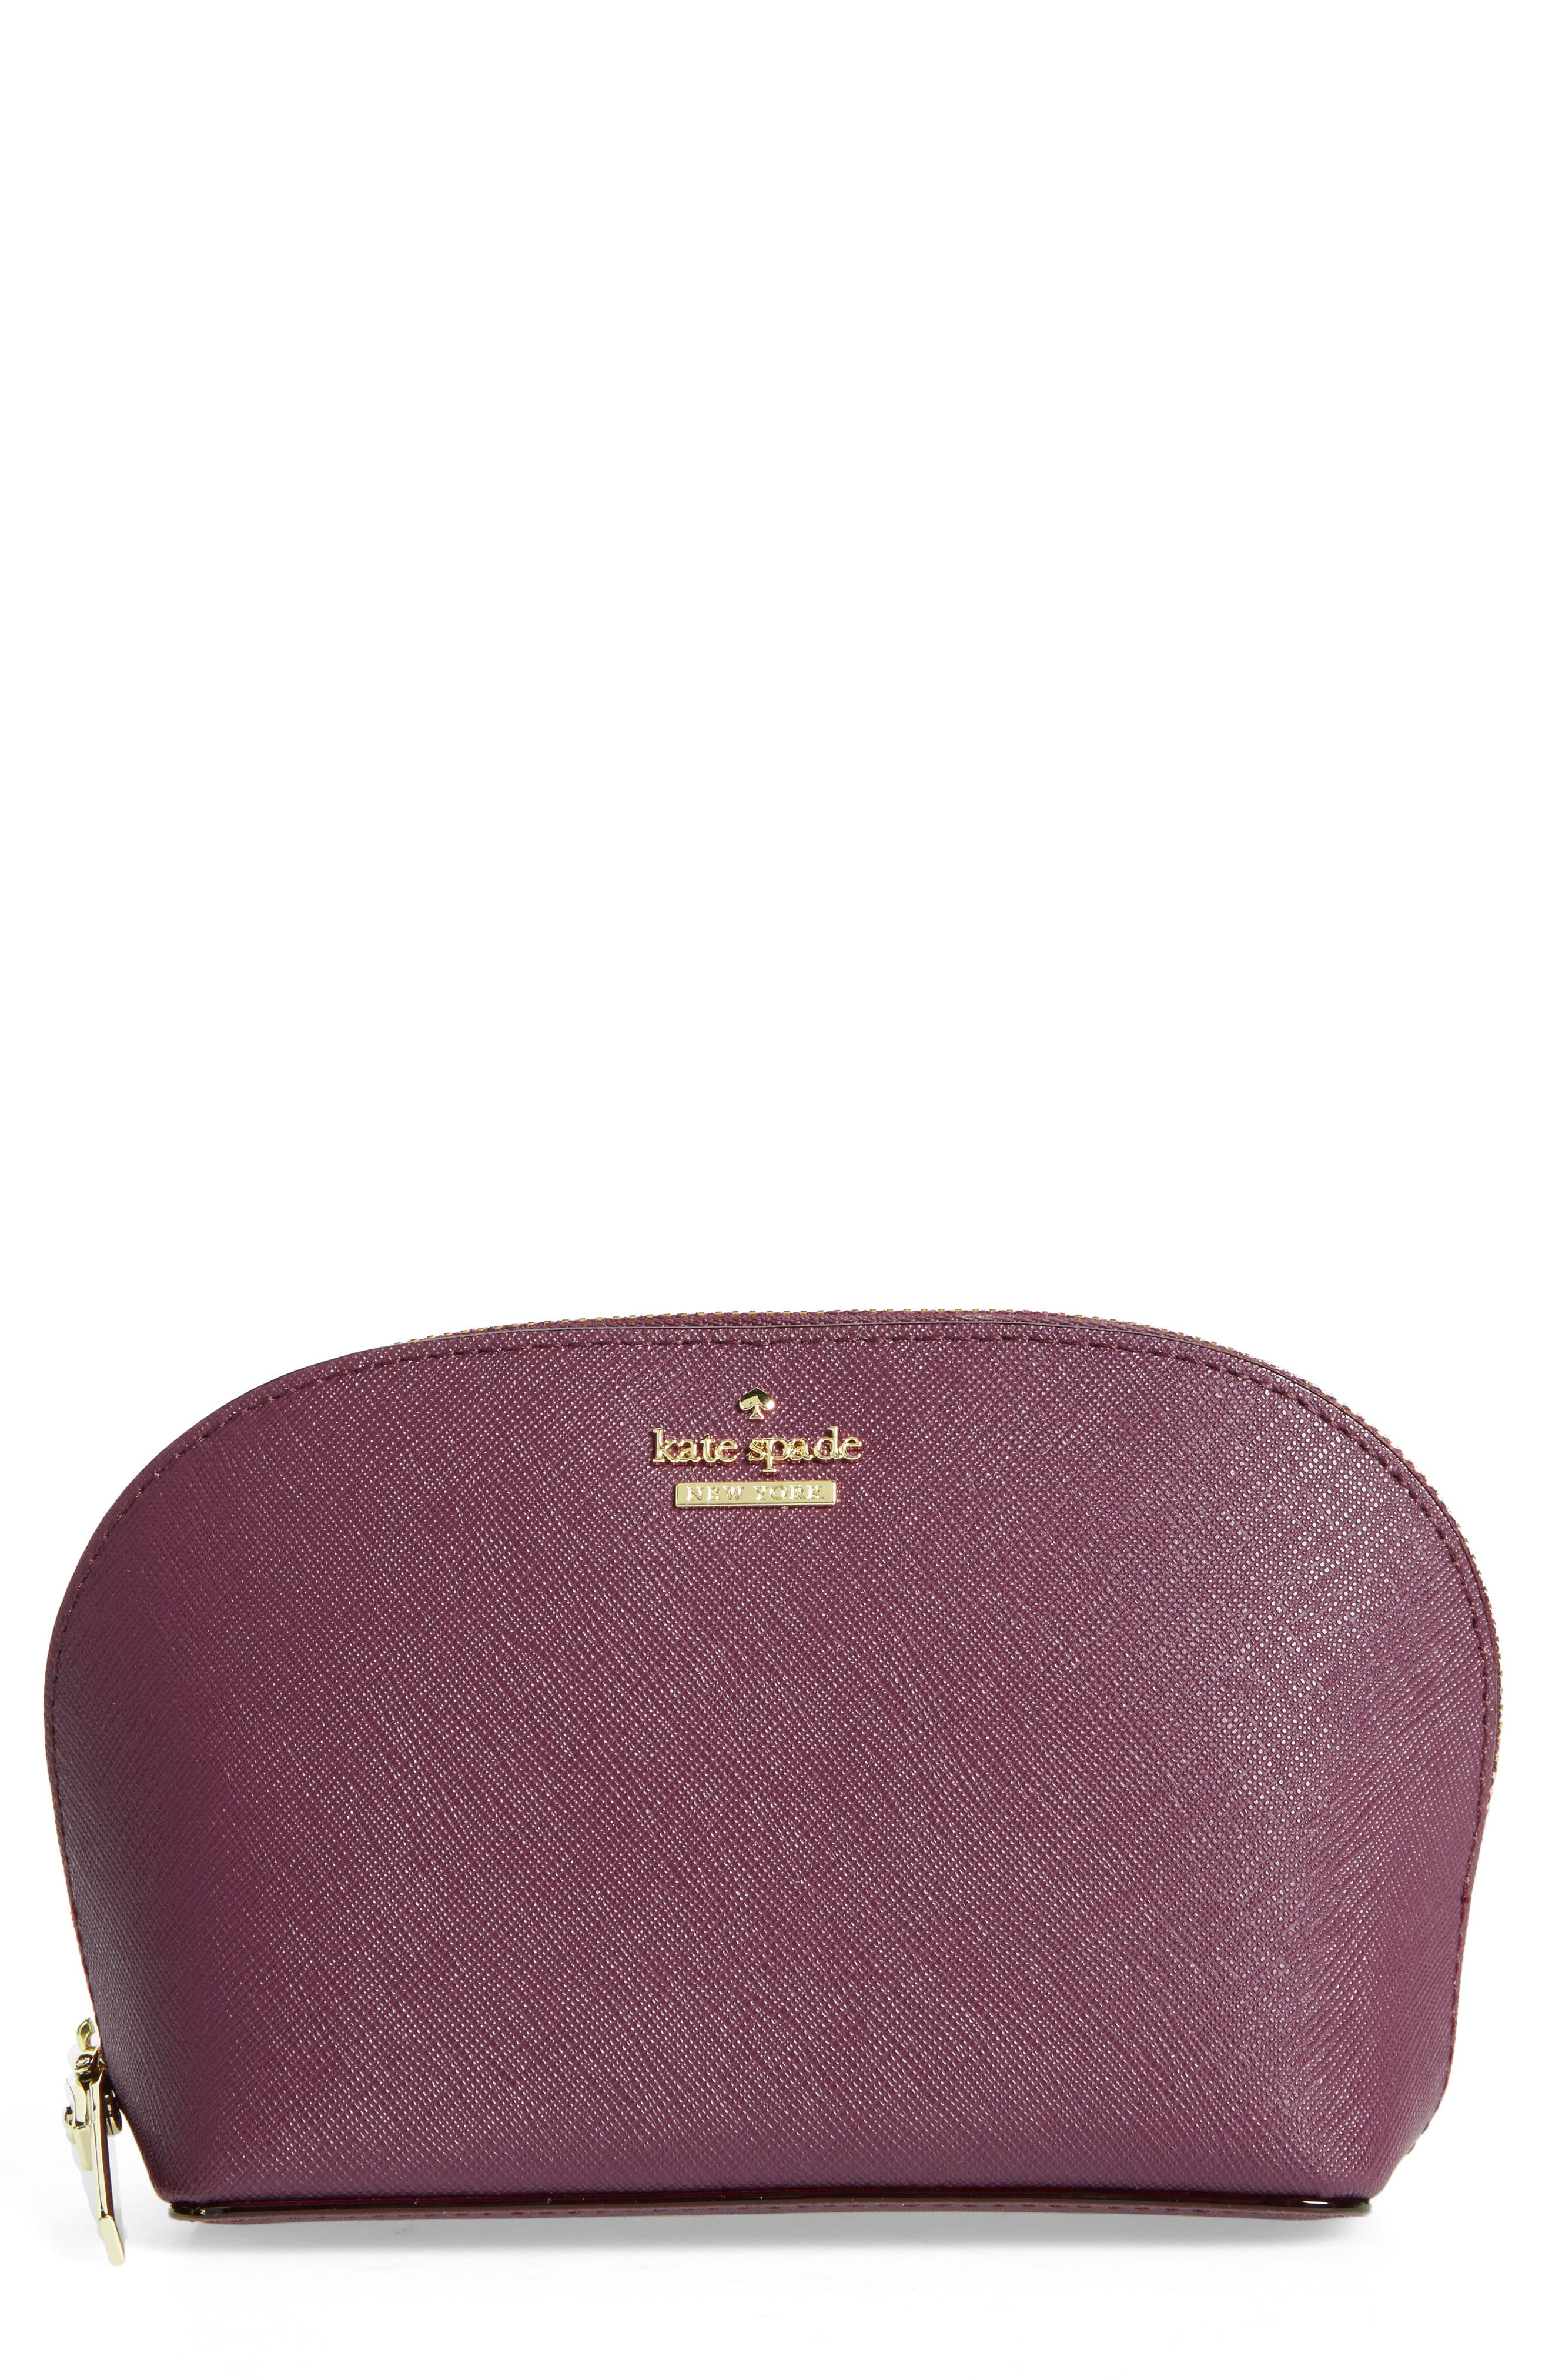 kate spade new york cameron street - small abalene leather cosmetics case